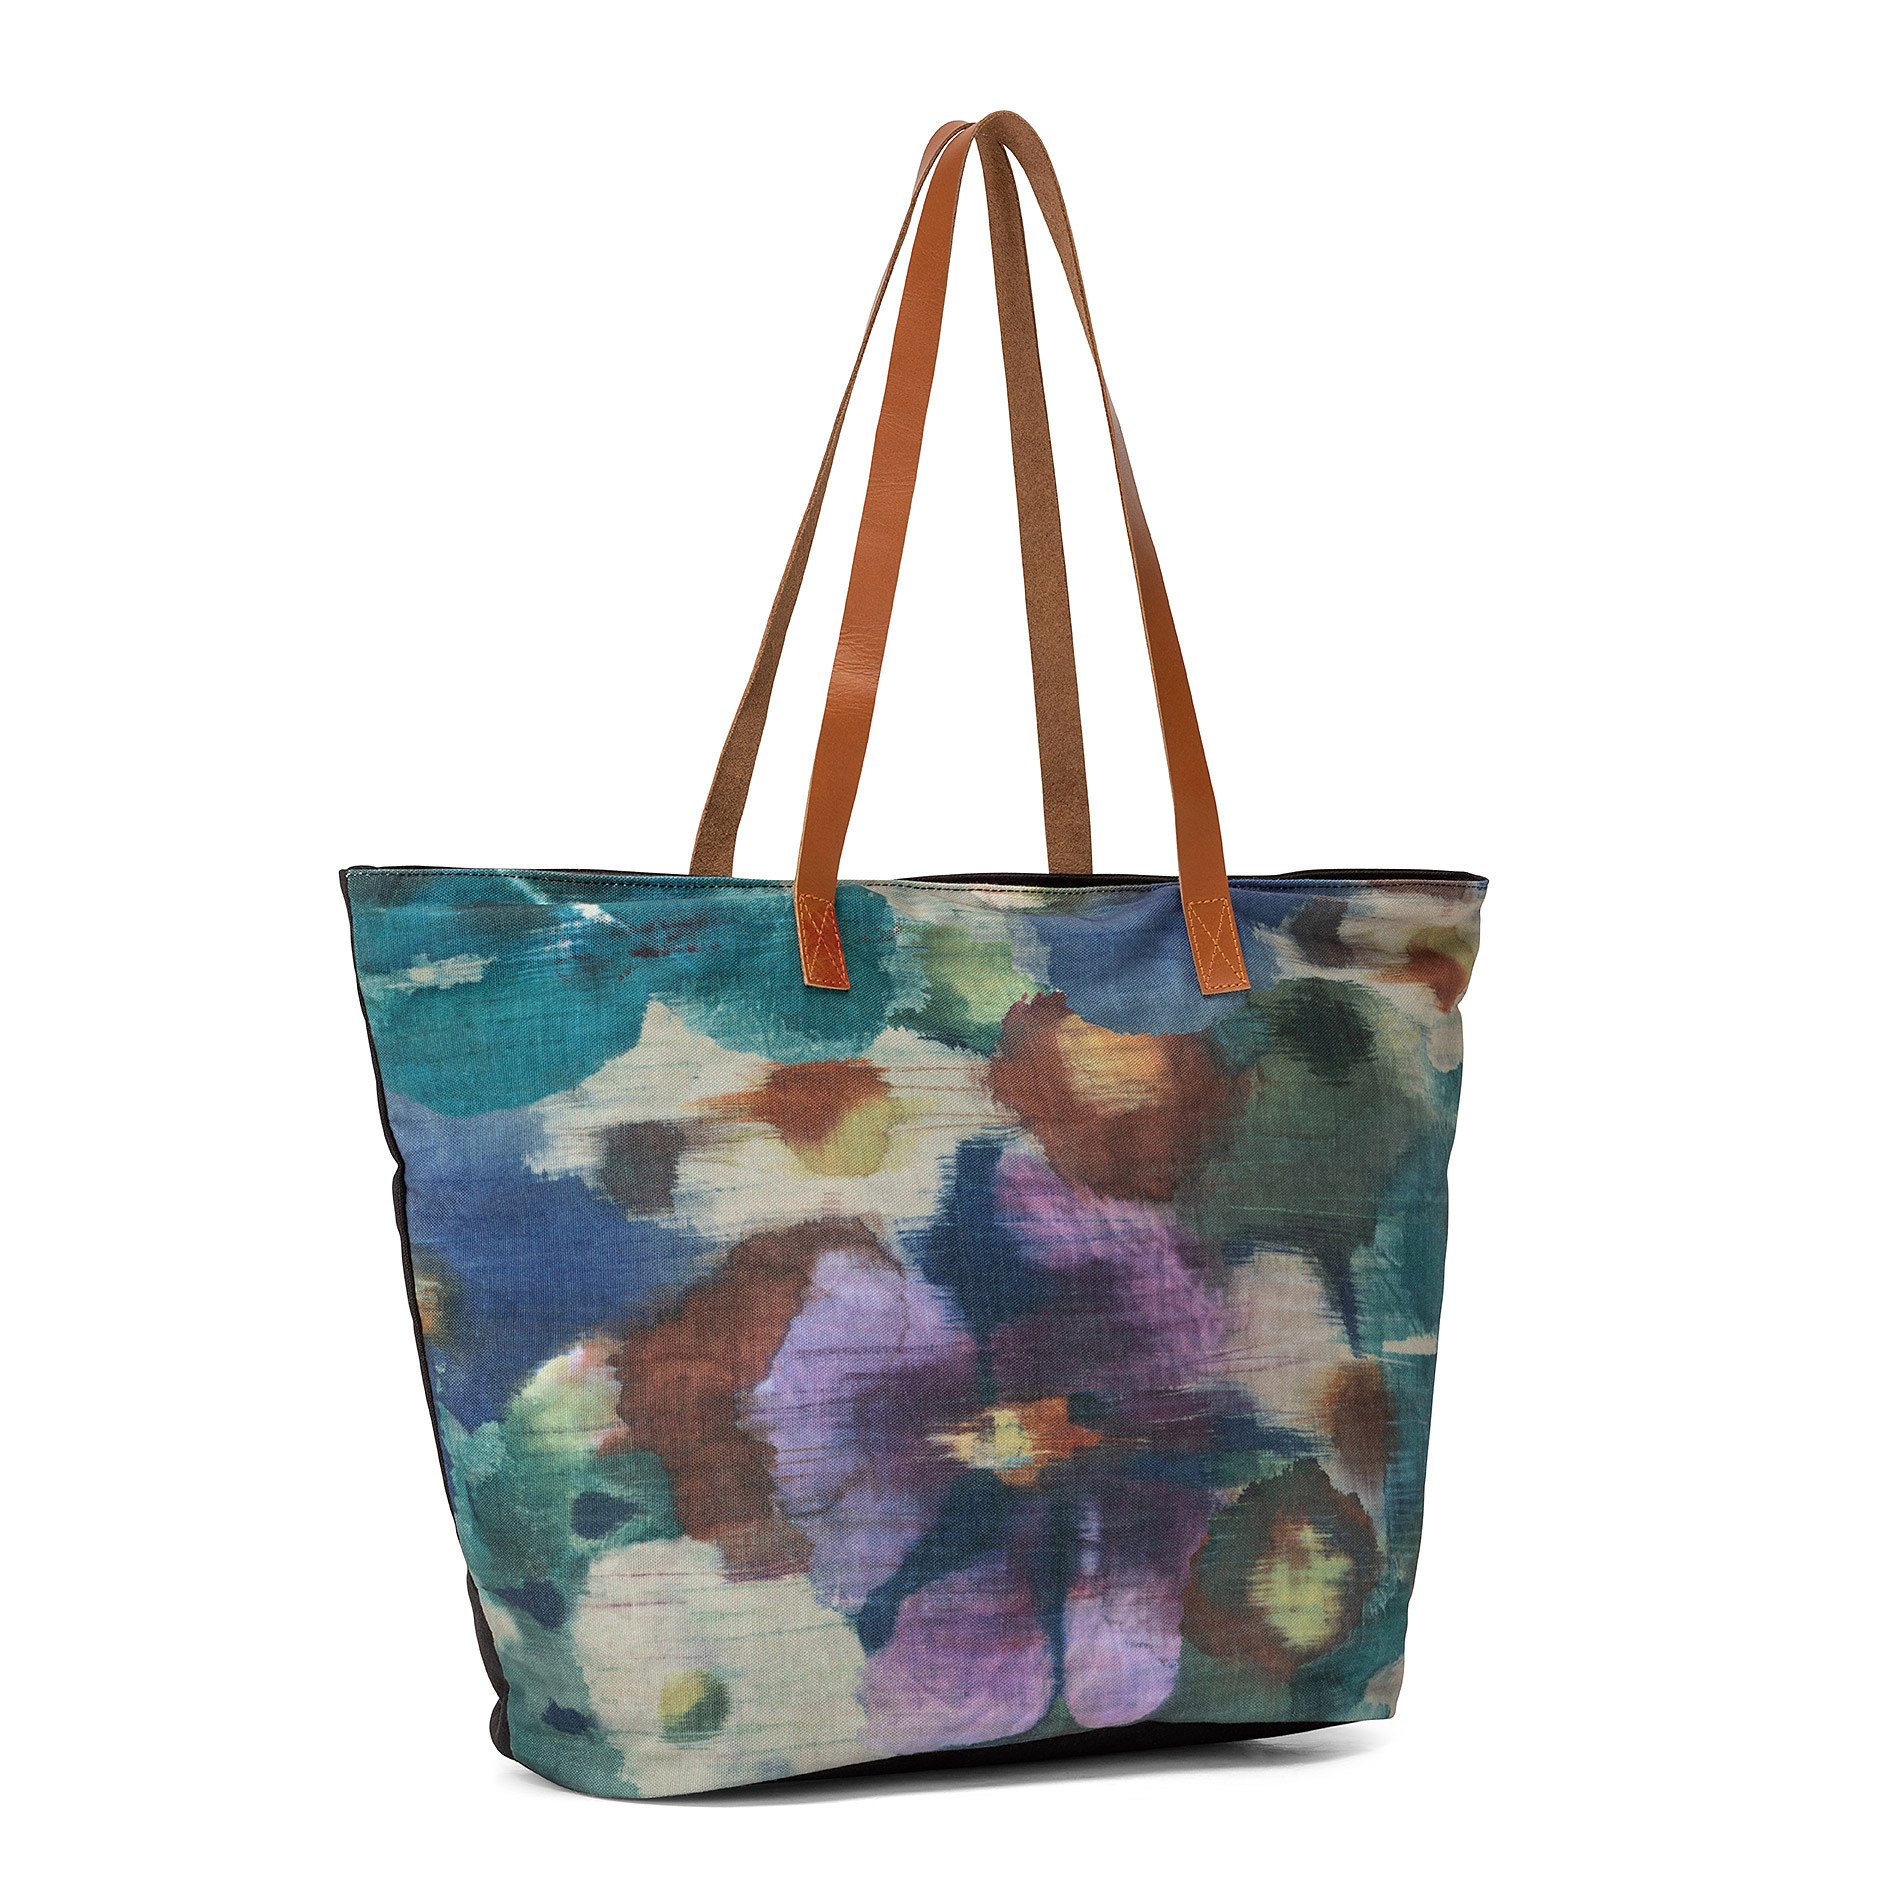 Shopper stampa floreale manici in pelle, Multicolor, large image number 1